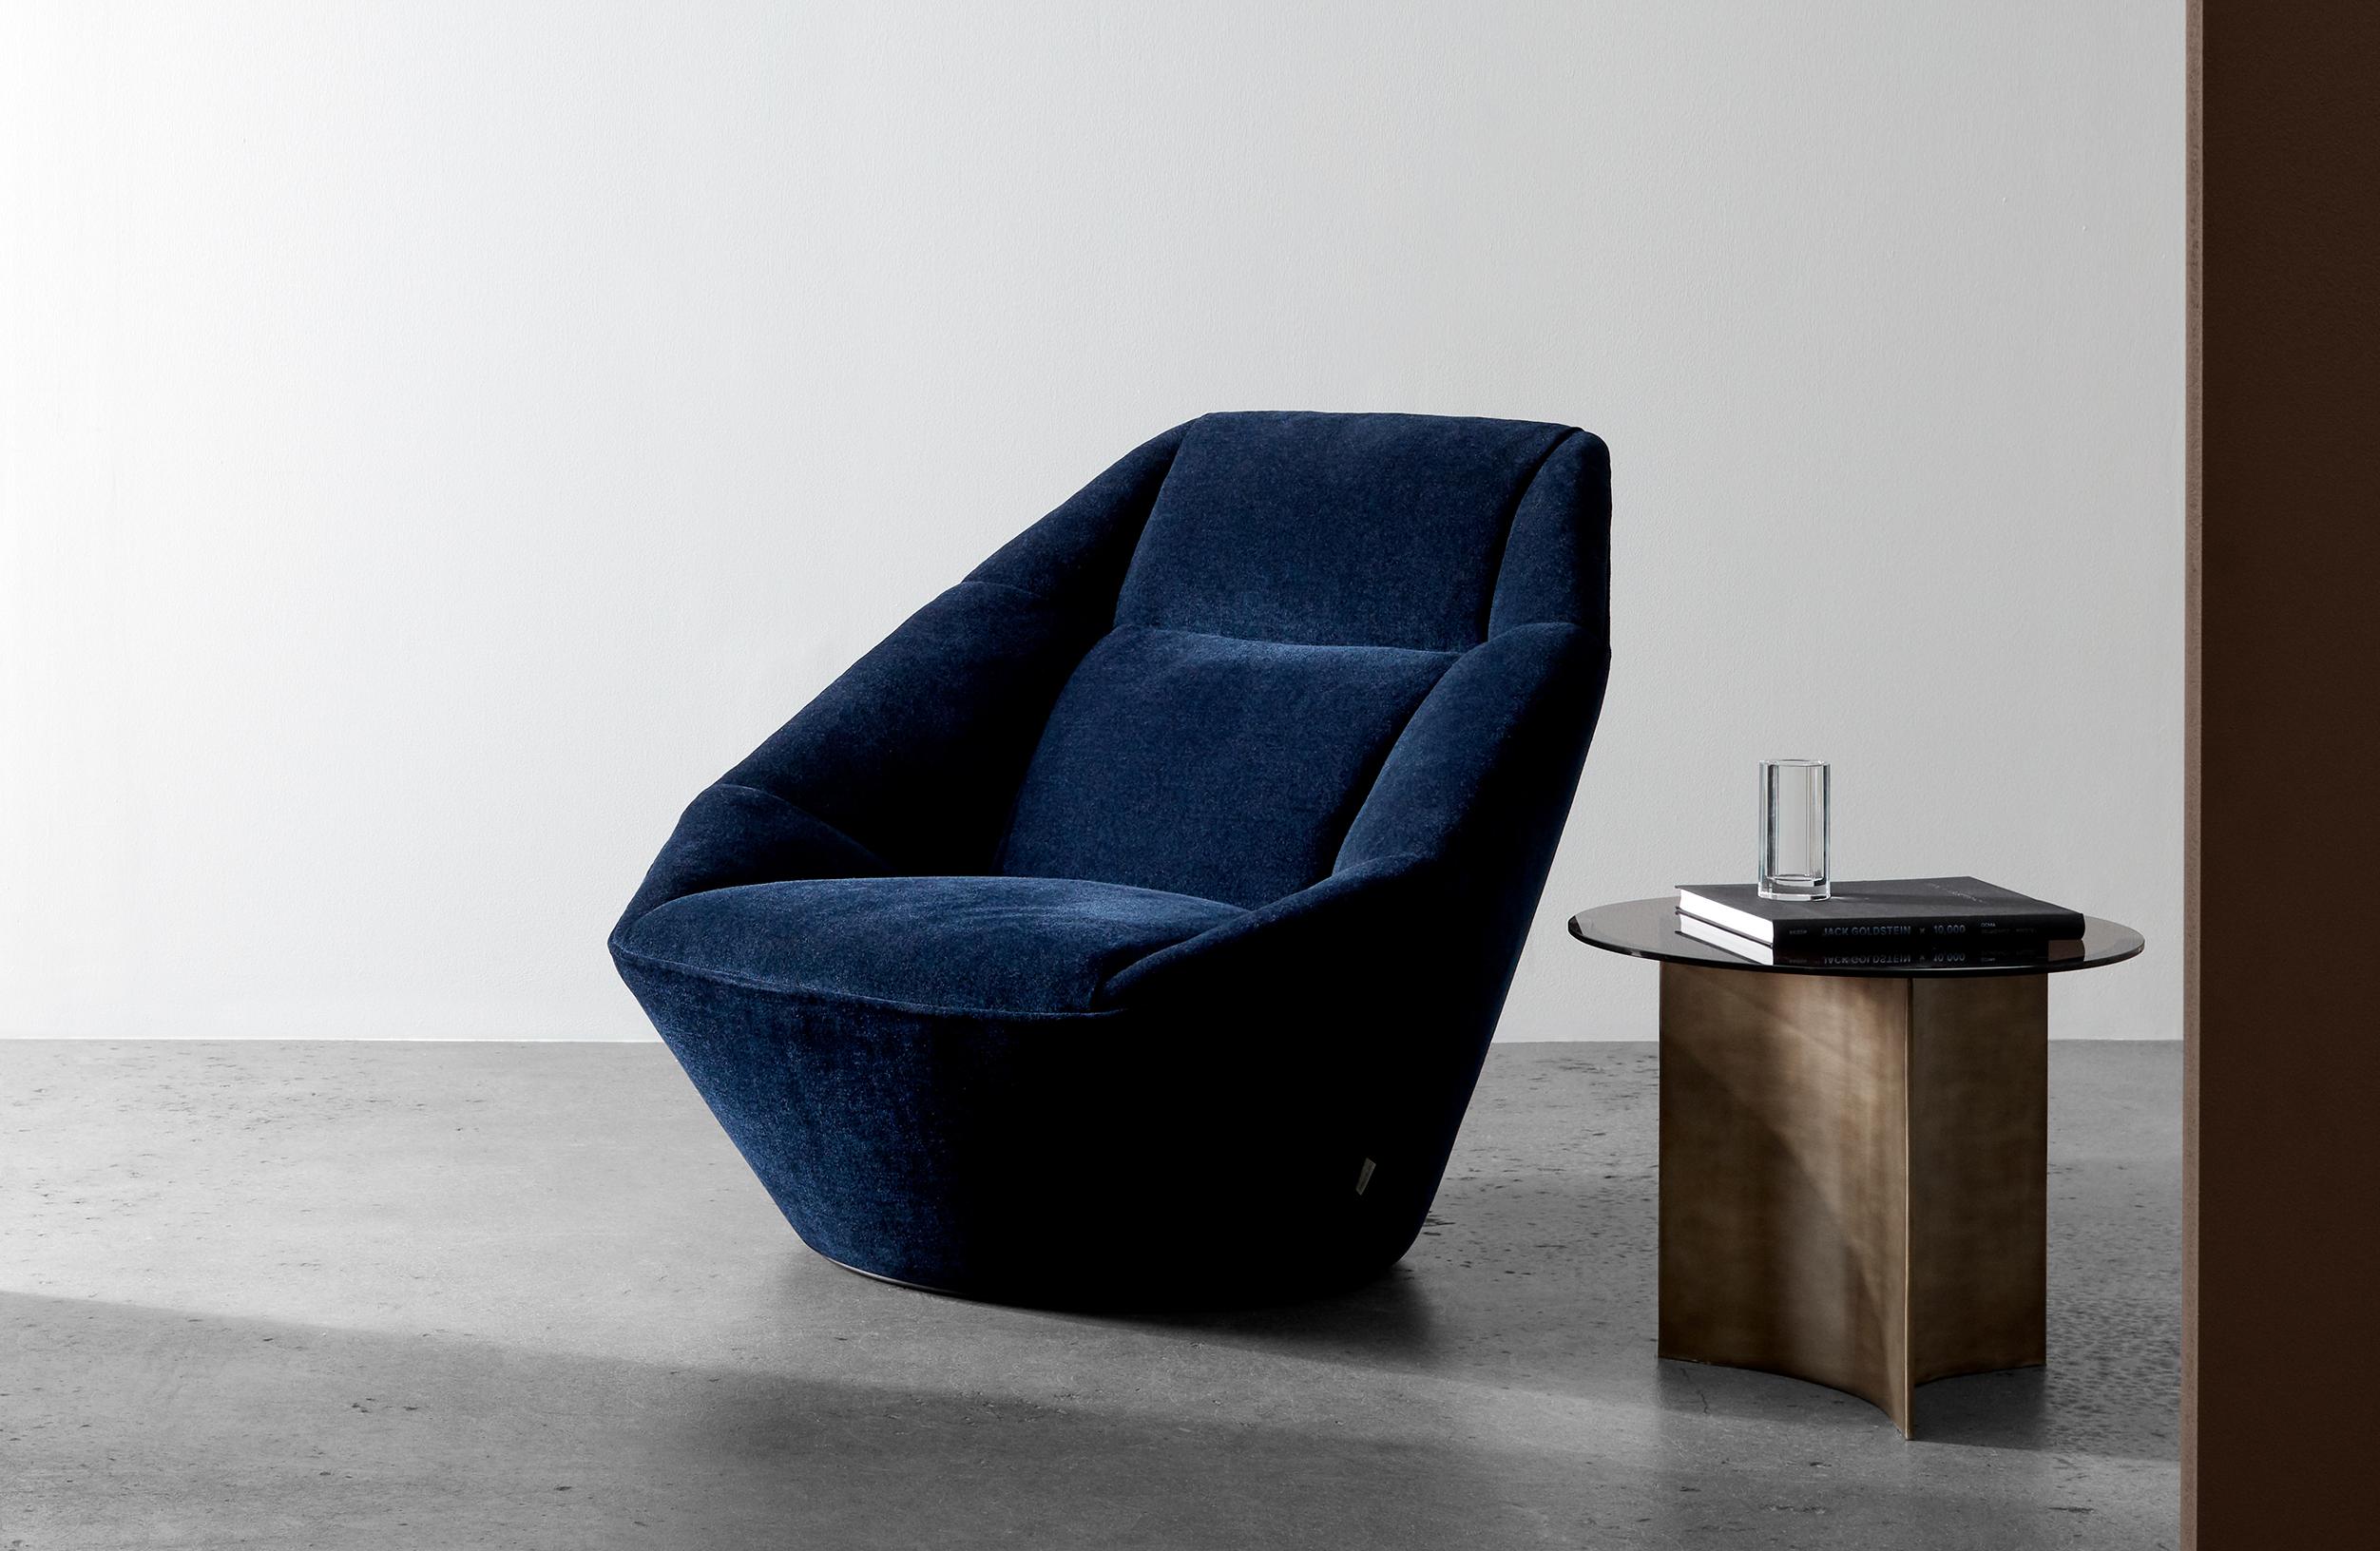 wendelbo-sail-armchair 01